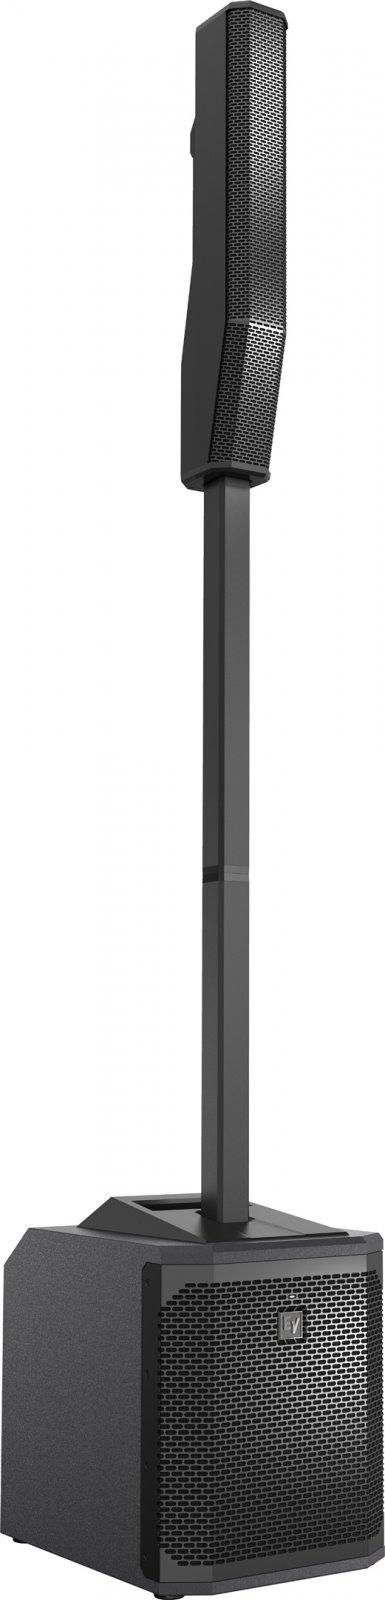 Electro-Voice Evolve 30M Portable Powered Column Loudspeaker System